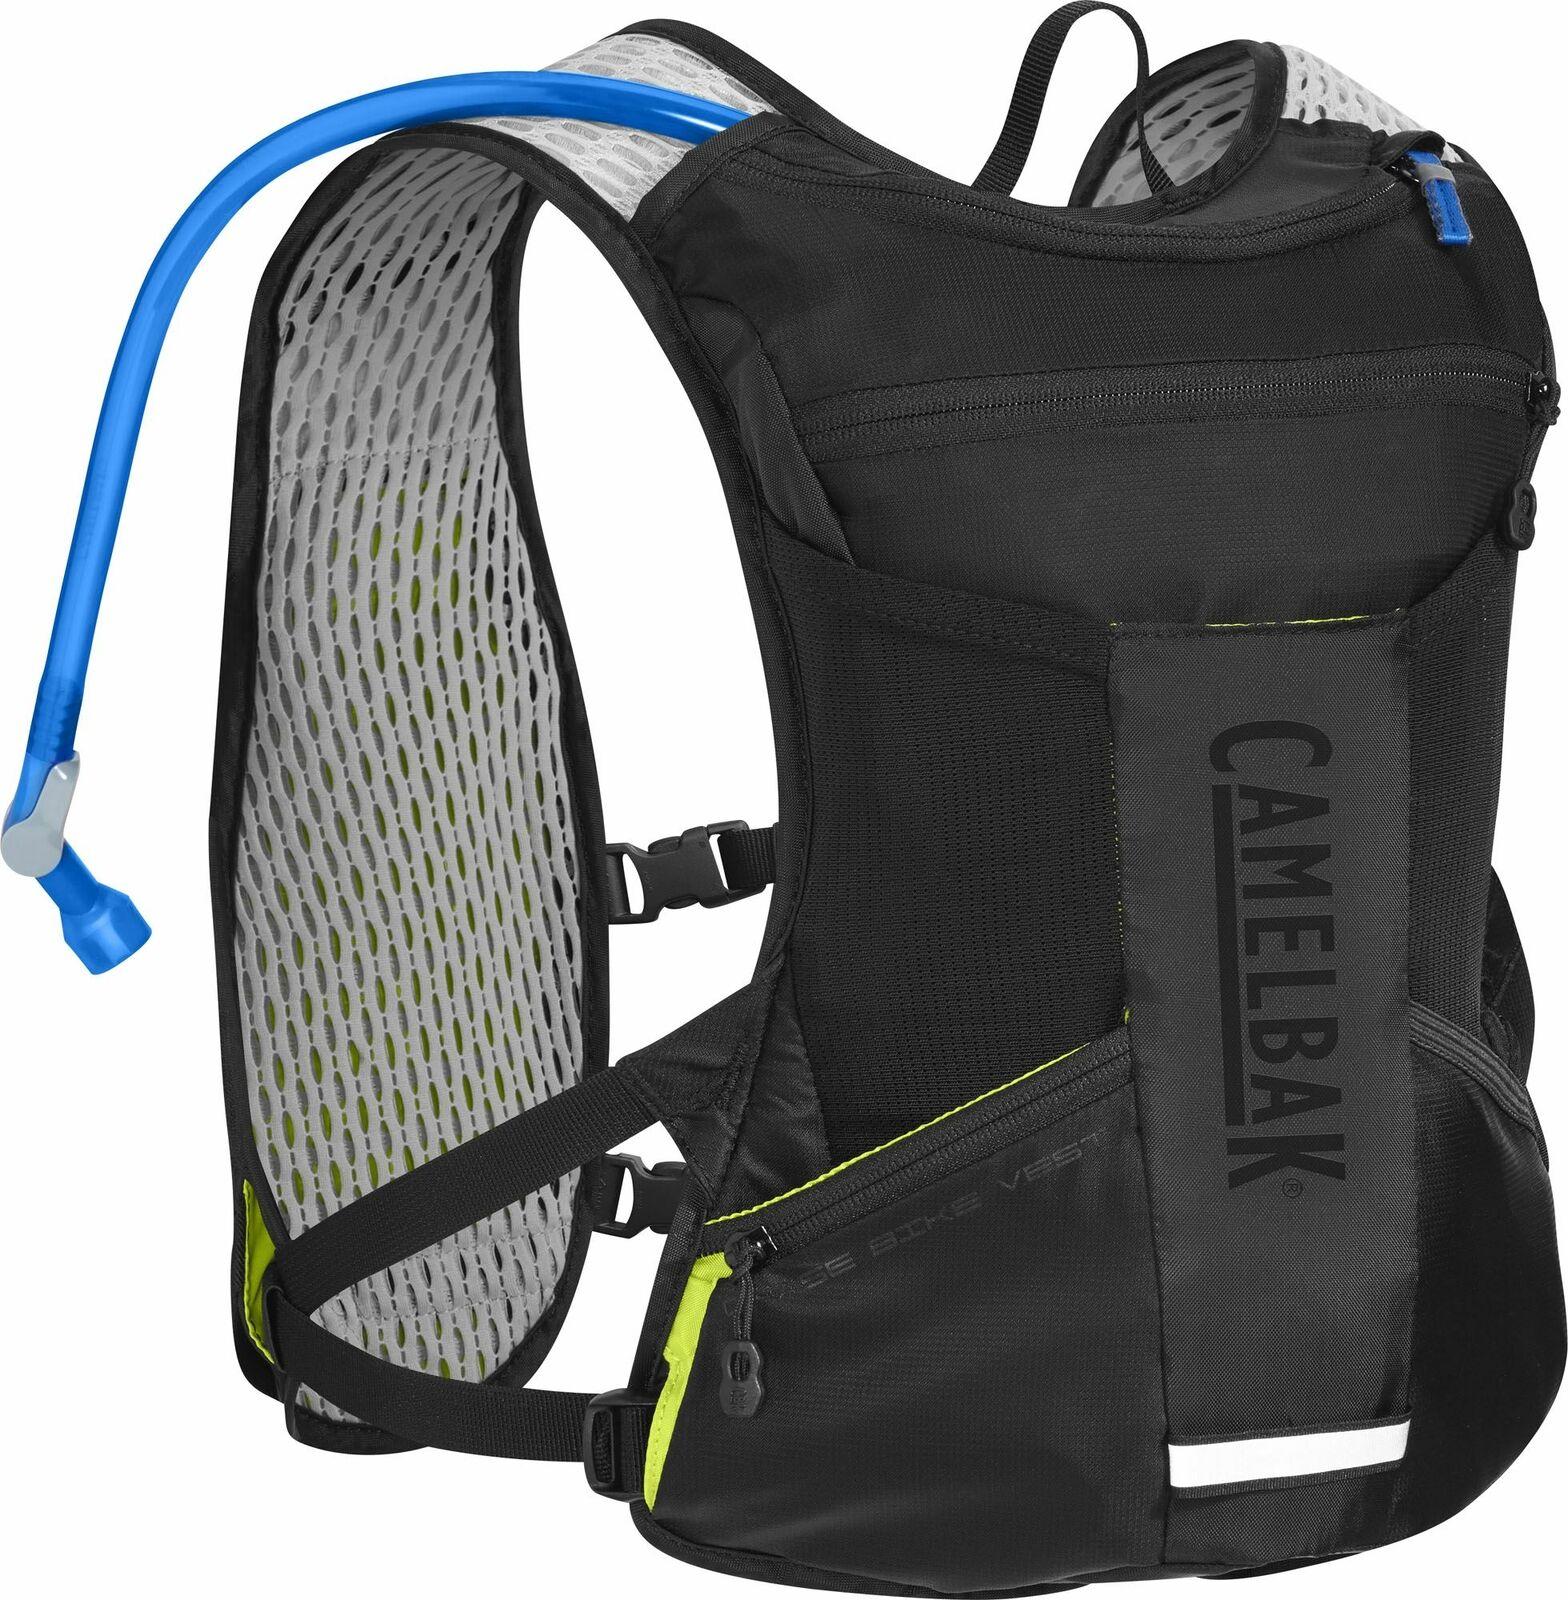 Camelbak Rucksack Weste mit Trinkblase CHASE 1,5L Backpack Fahrradrucksack